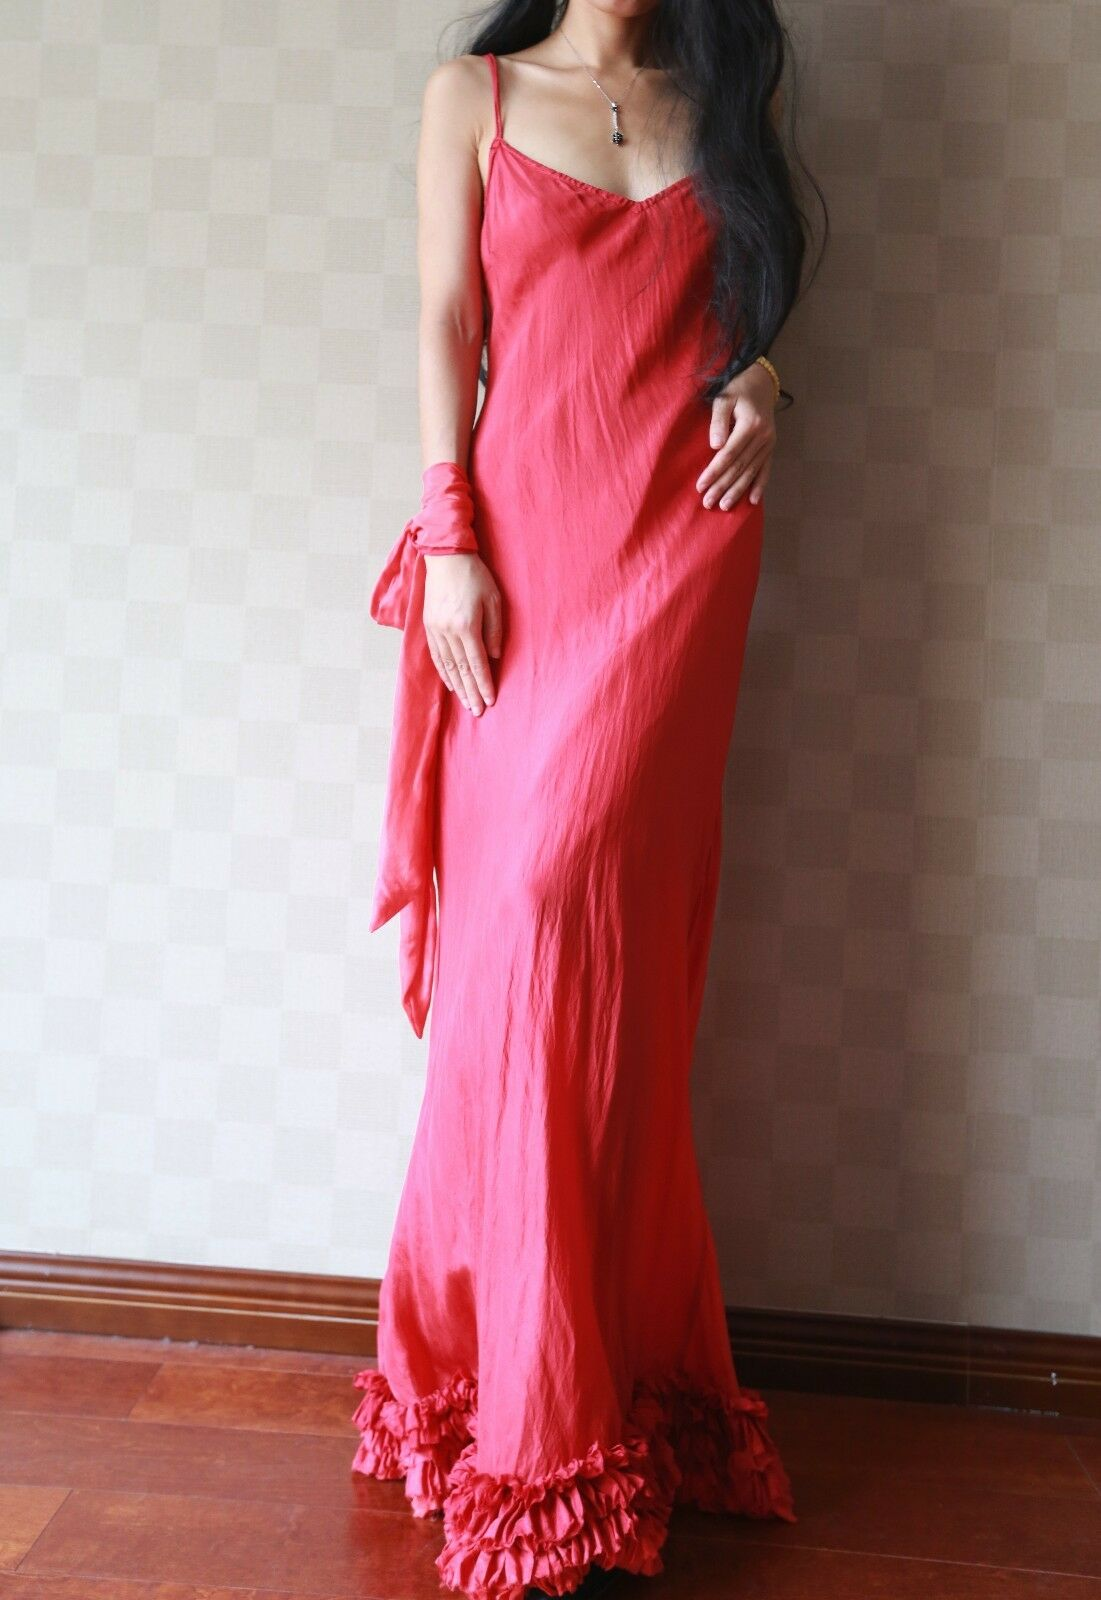 100% Natural Silk Handmade Dress, Independent Designer